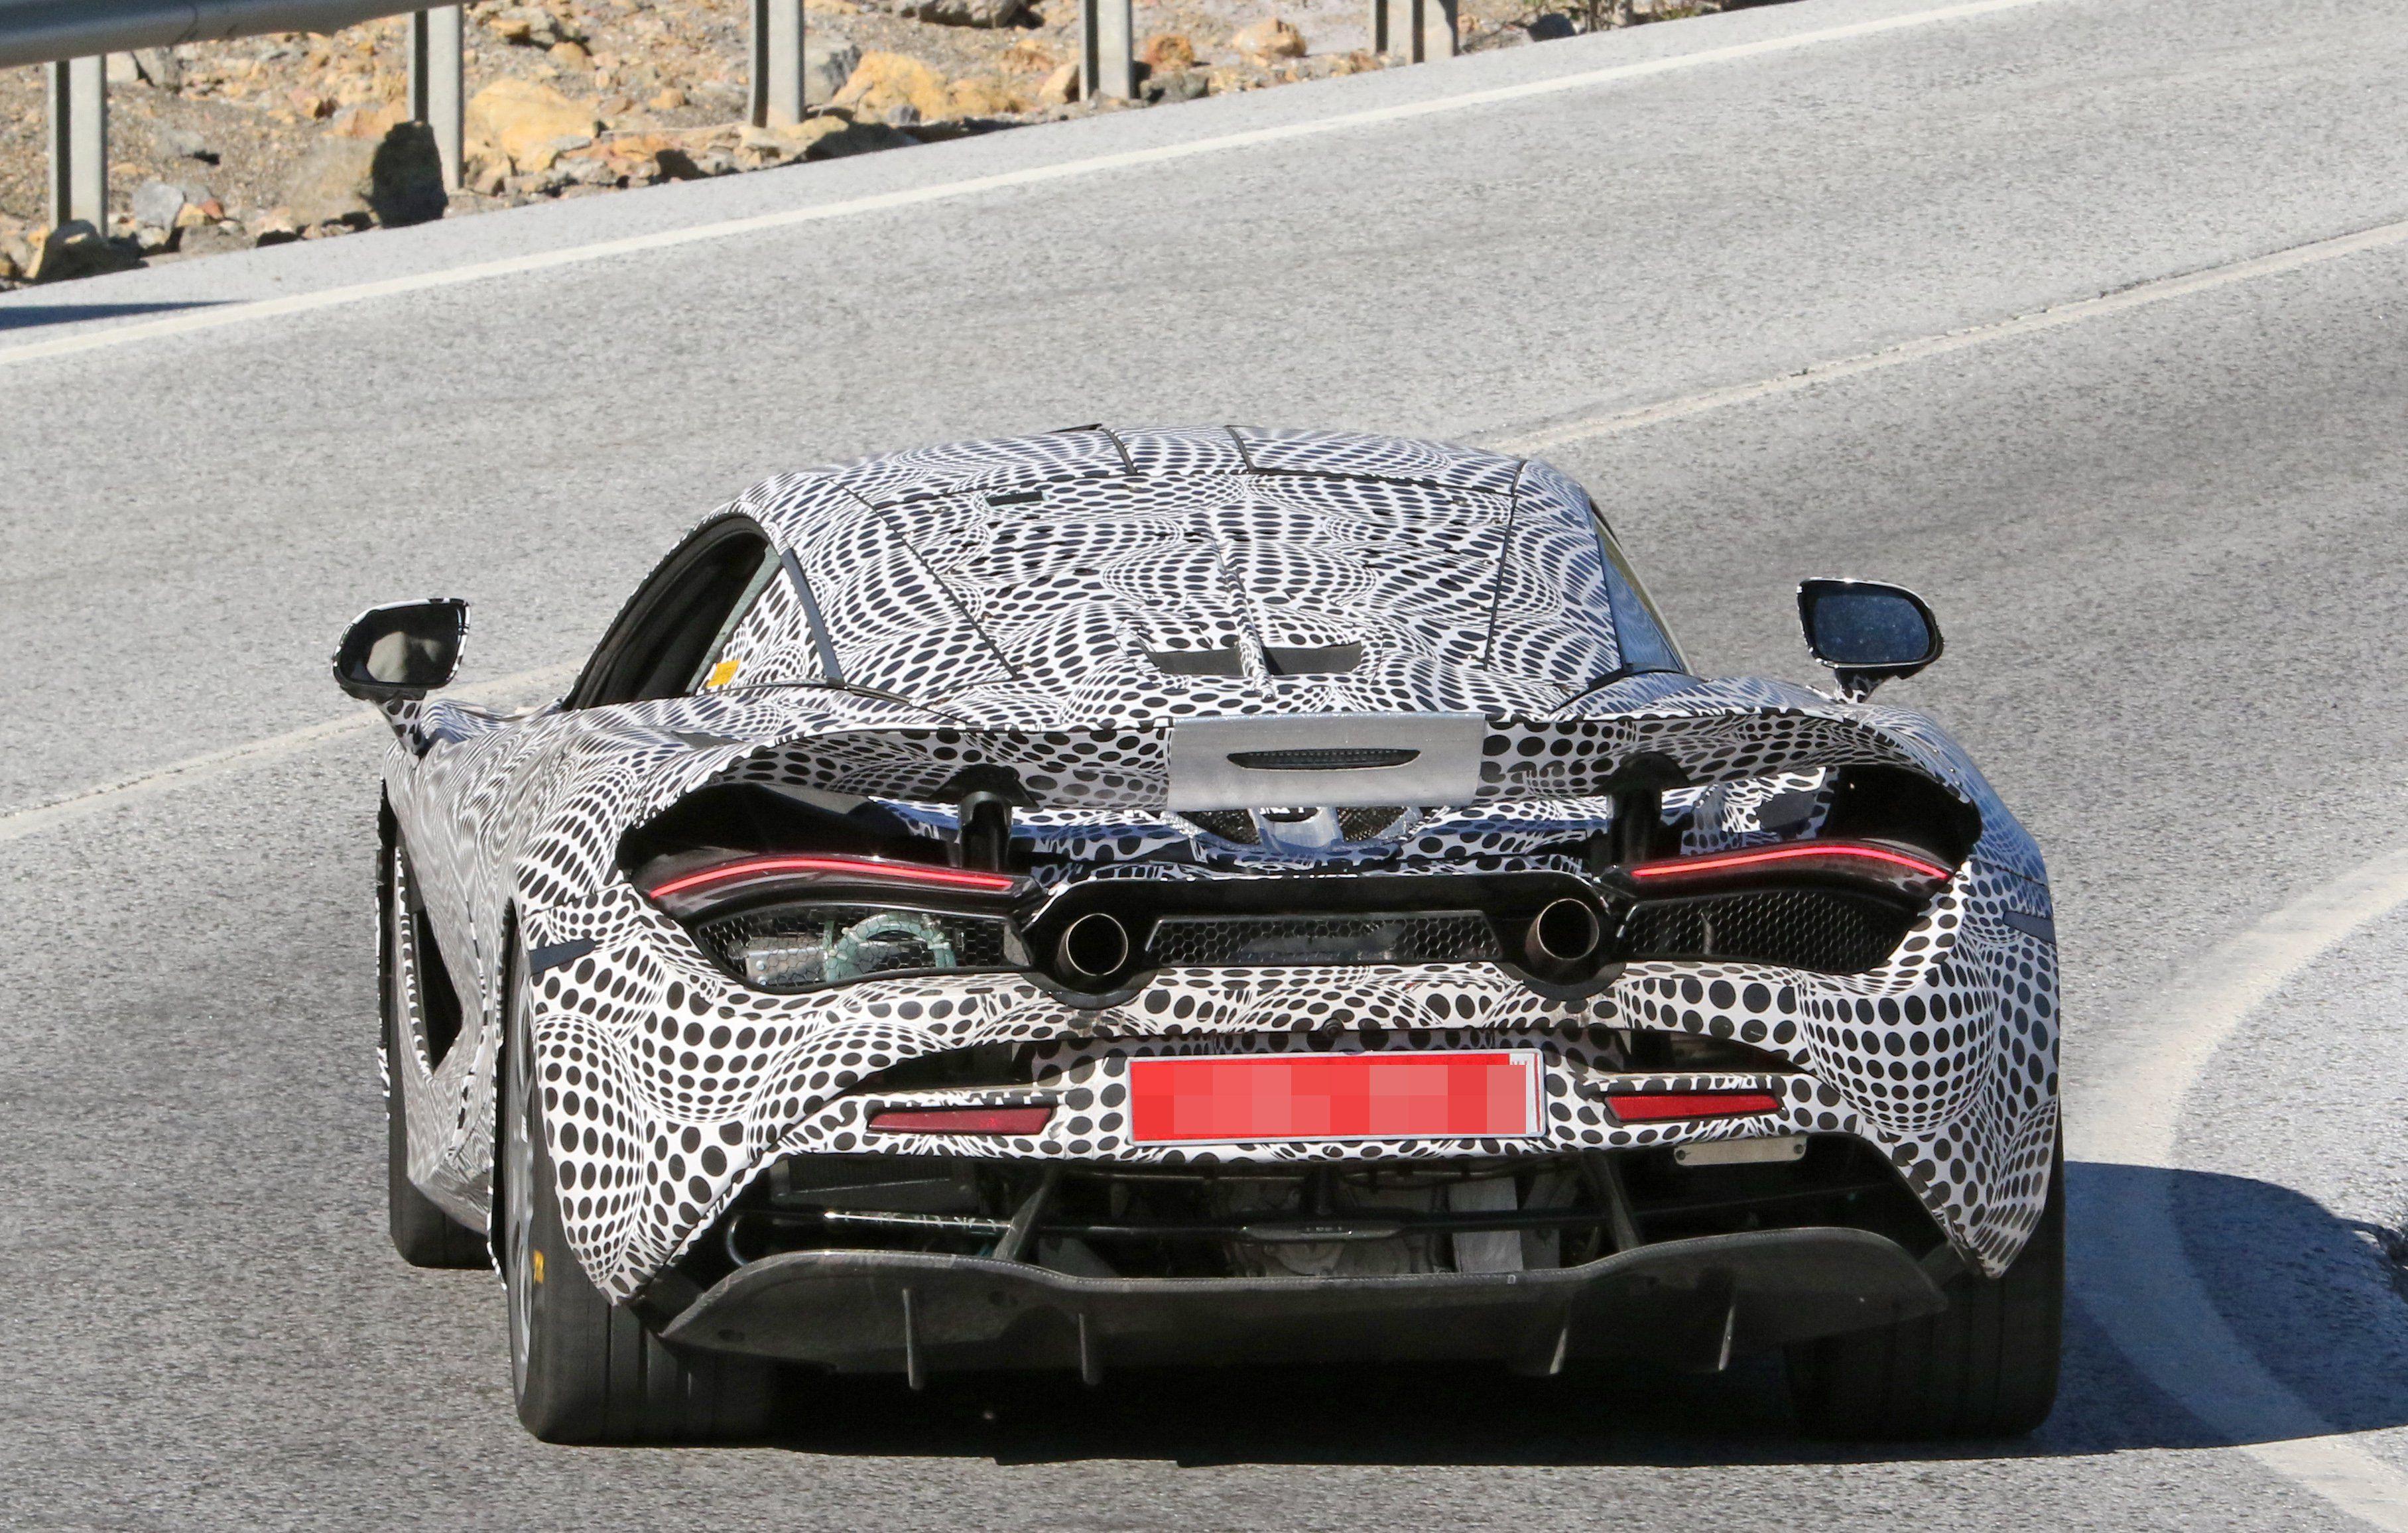 2021 Mclaren Hybrid Sports Car Top Speed Hybrid Sports Car Sports Car Sports Cars Luxury